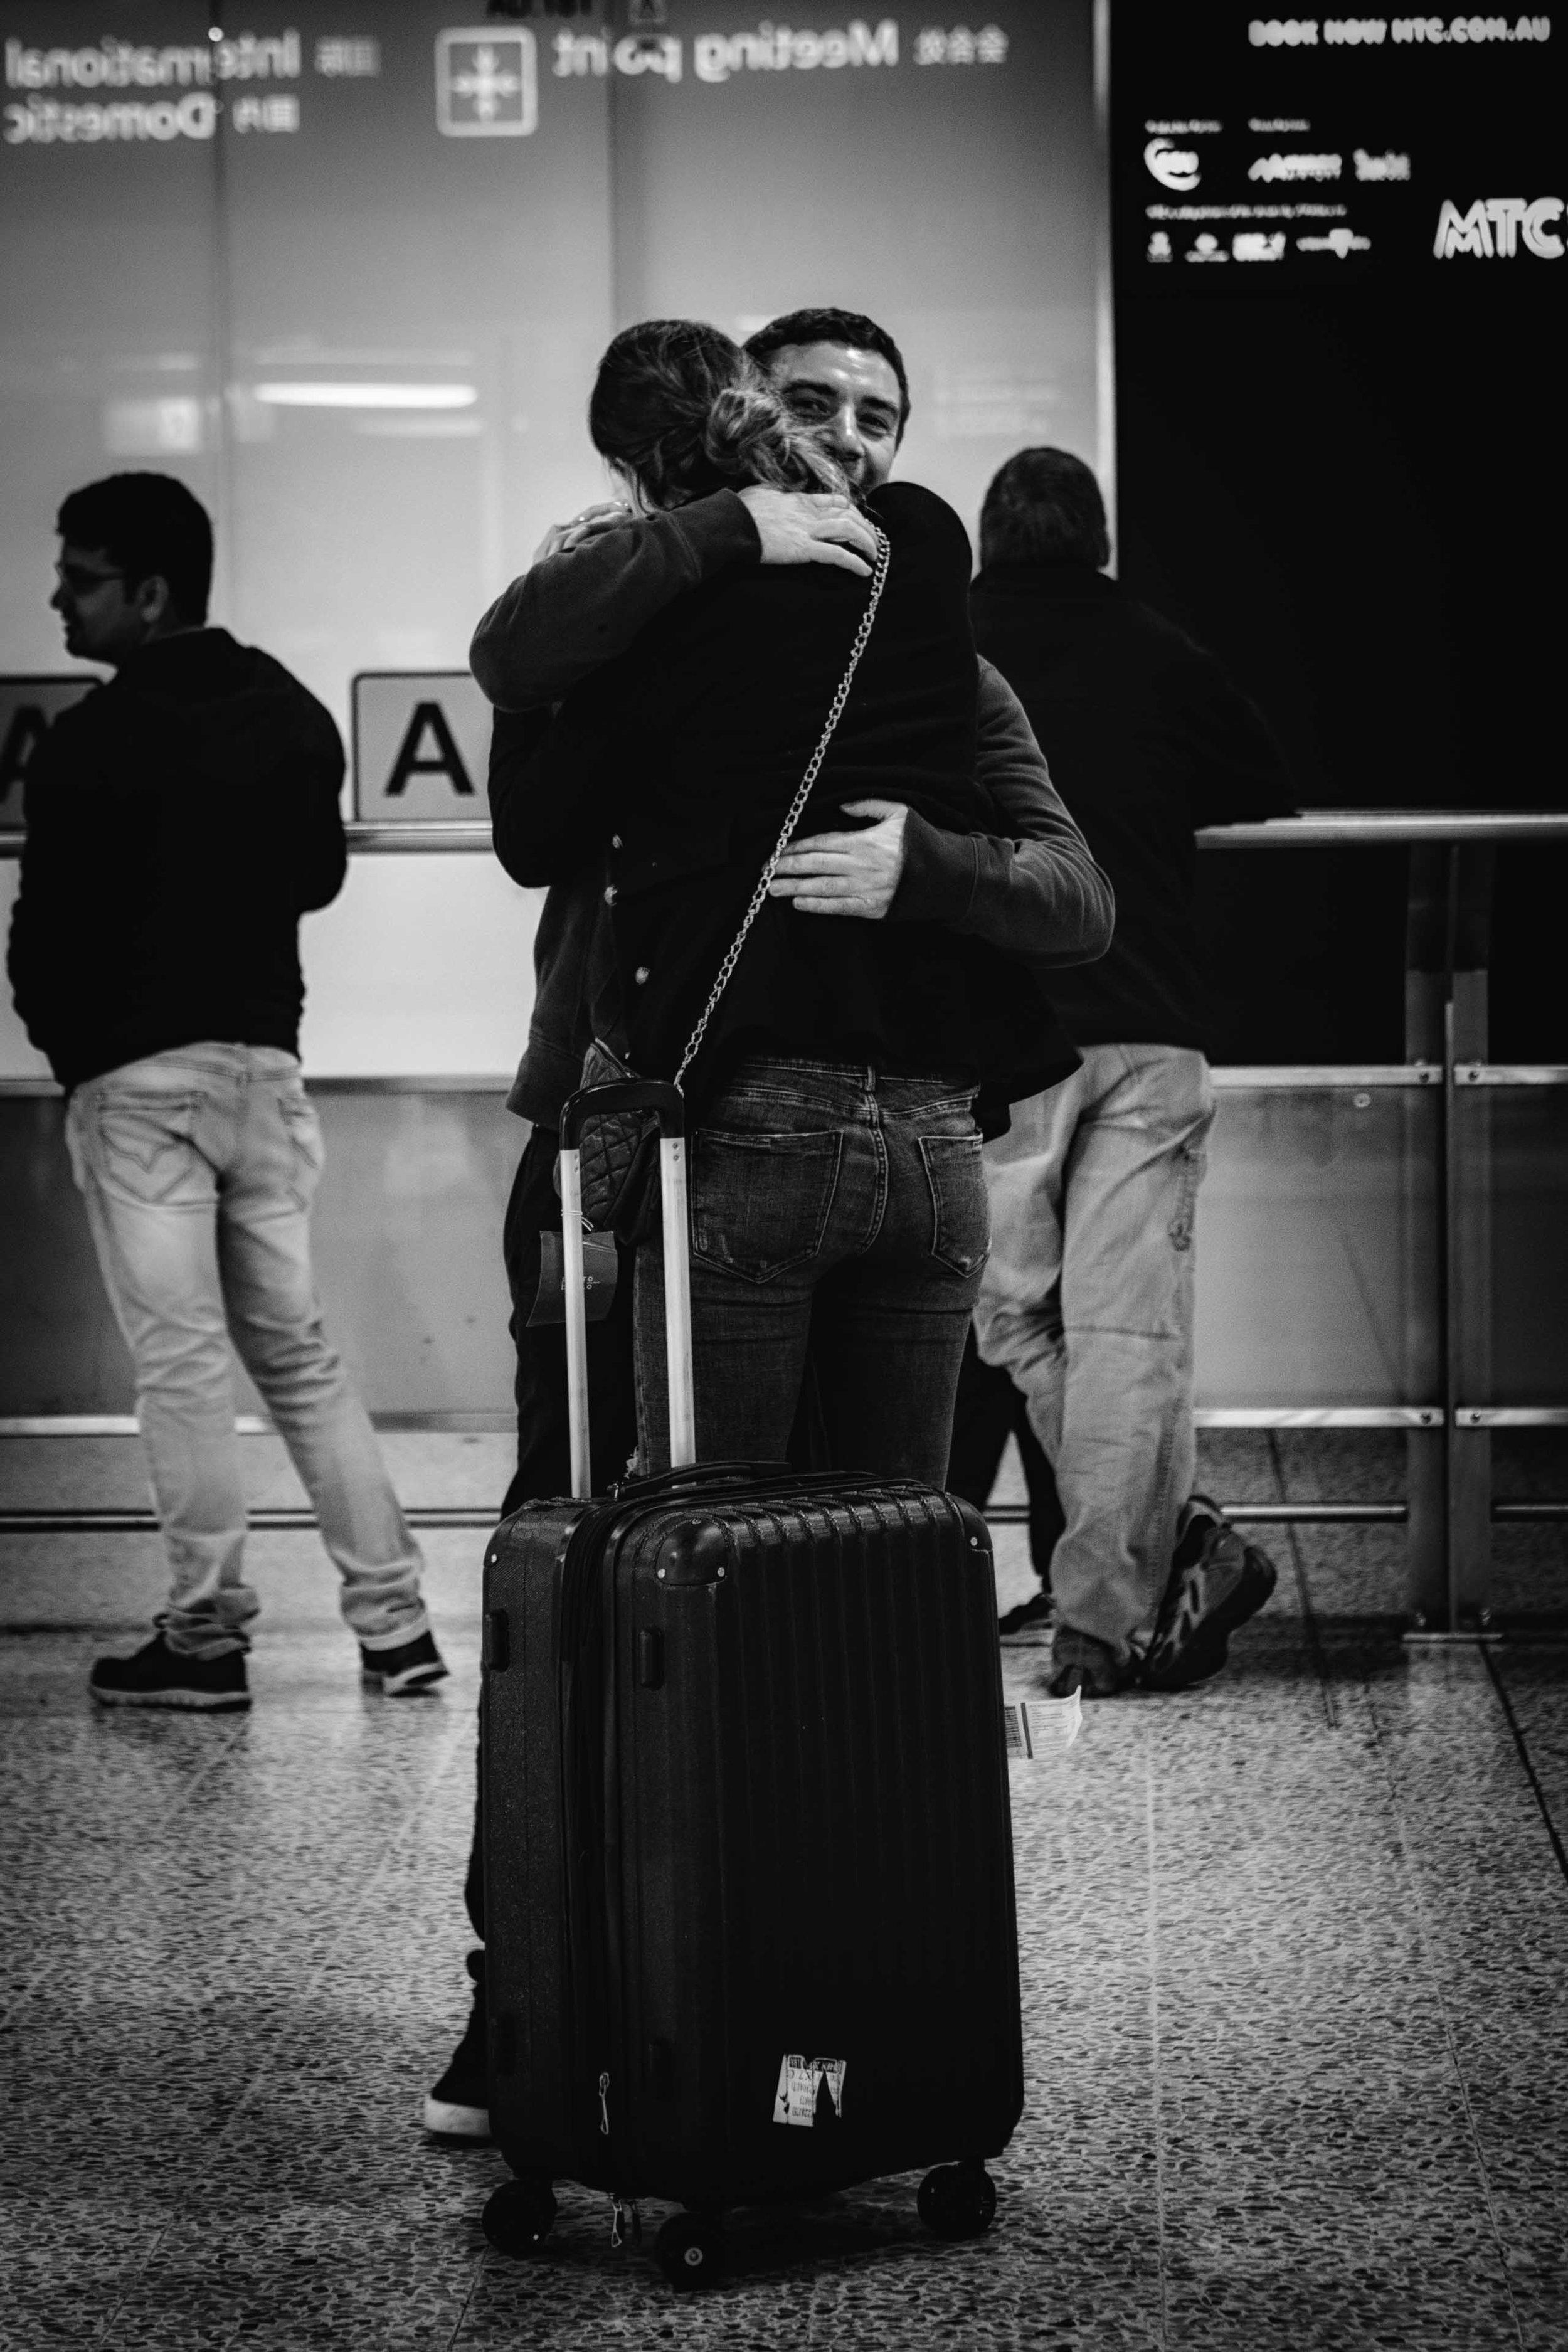 Melbourne airport love-7-2.jpg